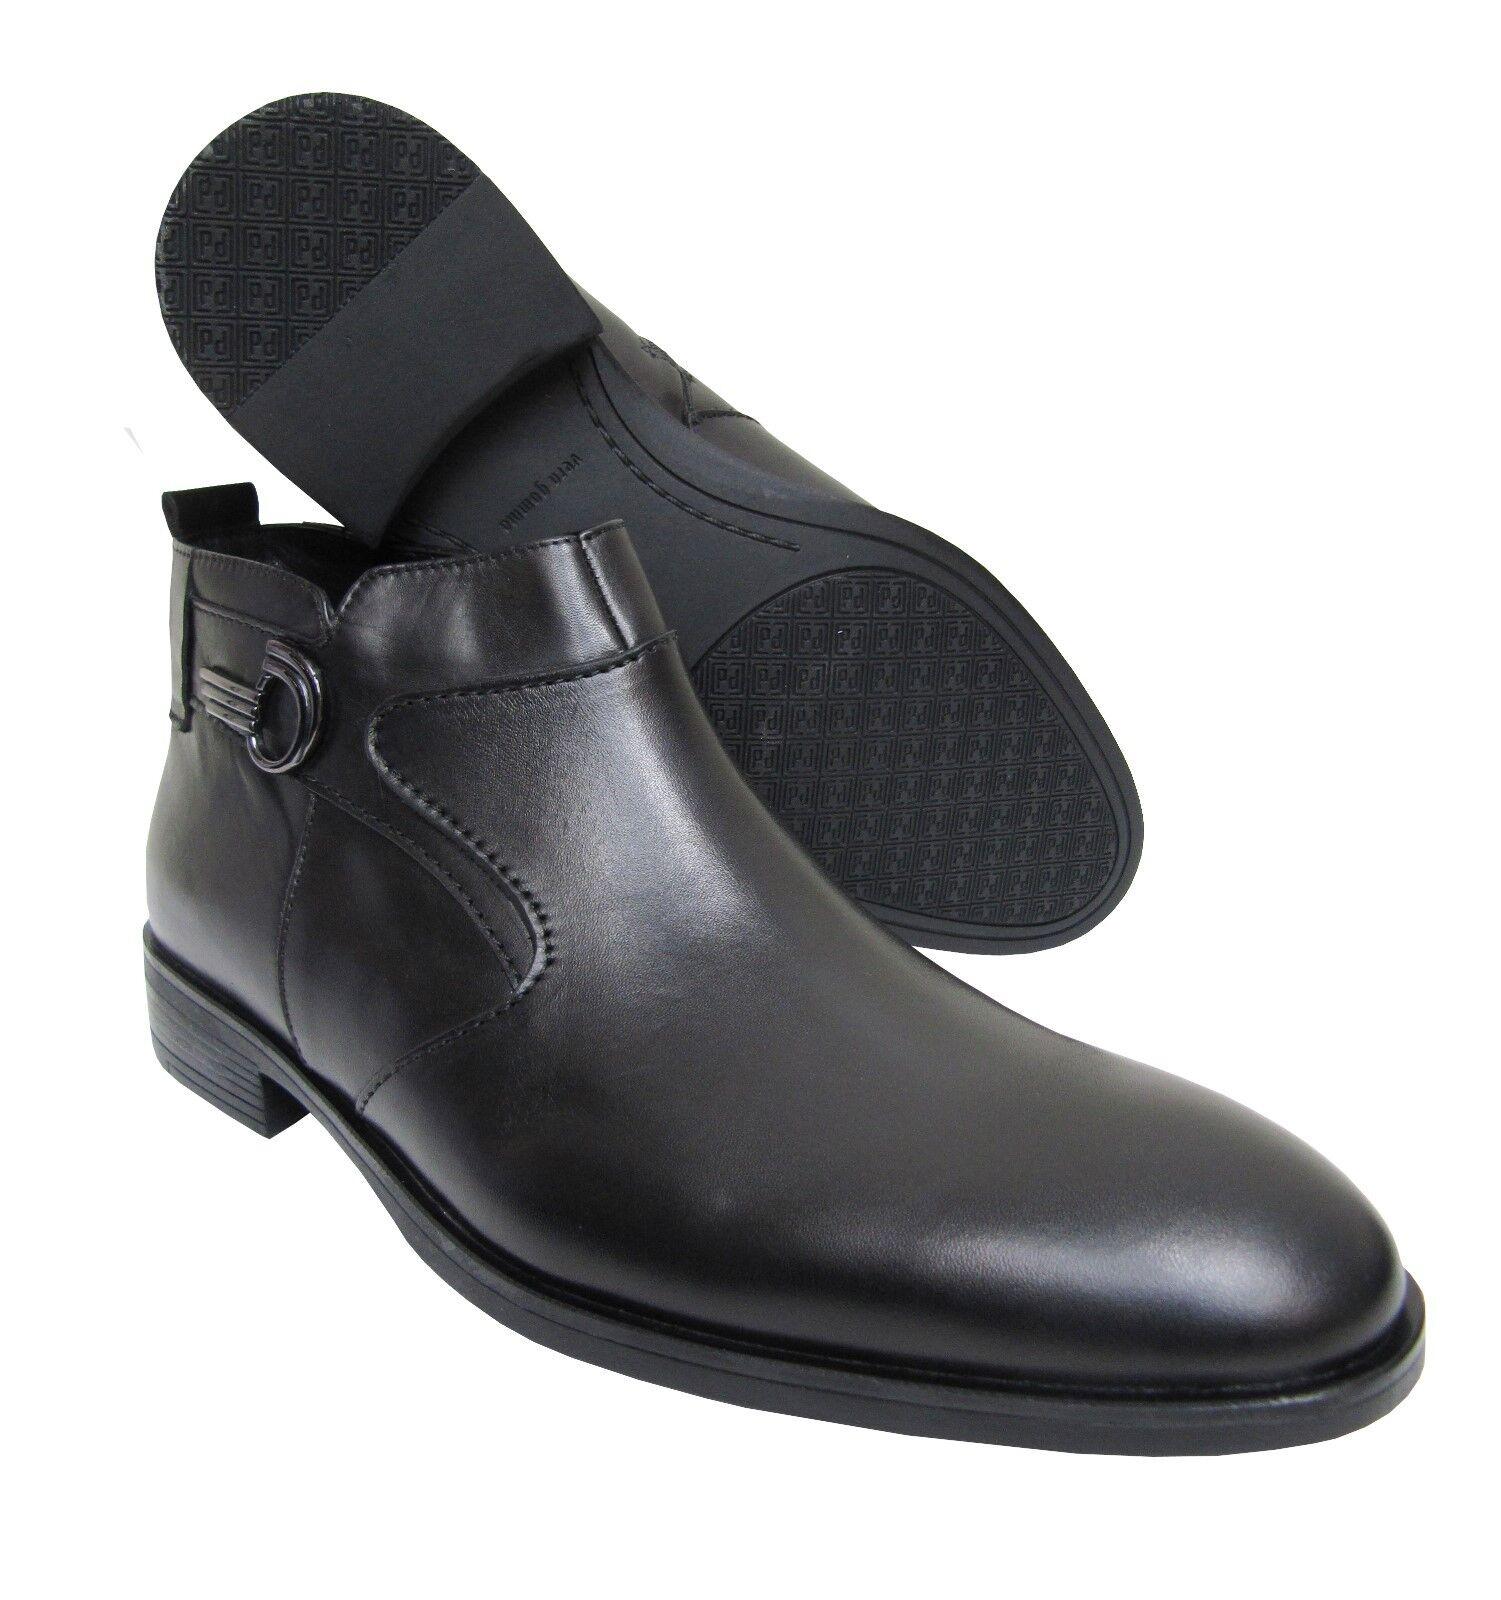 Herren Stiefeletten Boot Muga039Gr.46 Muga039Gr.46 Boot Schwarz e8ad24